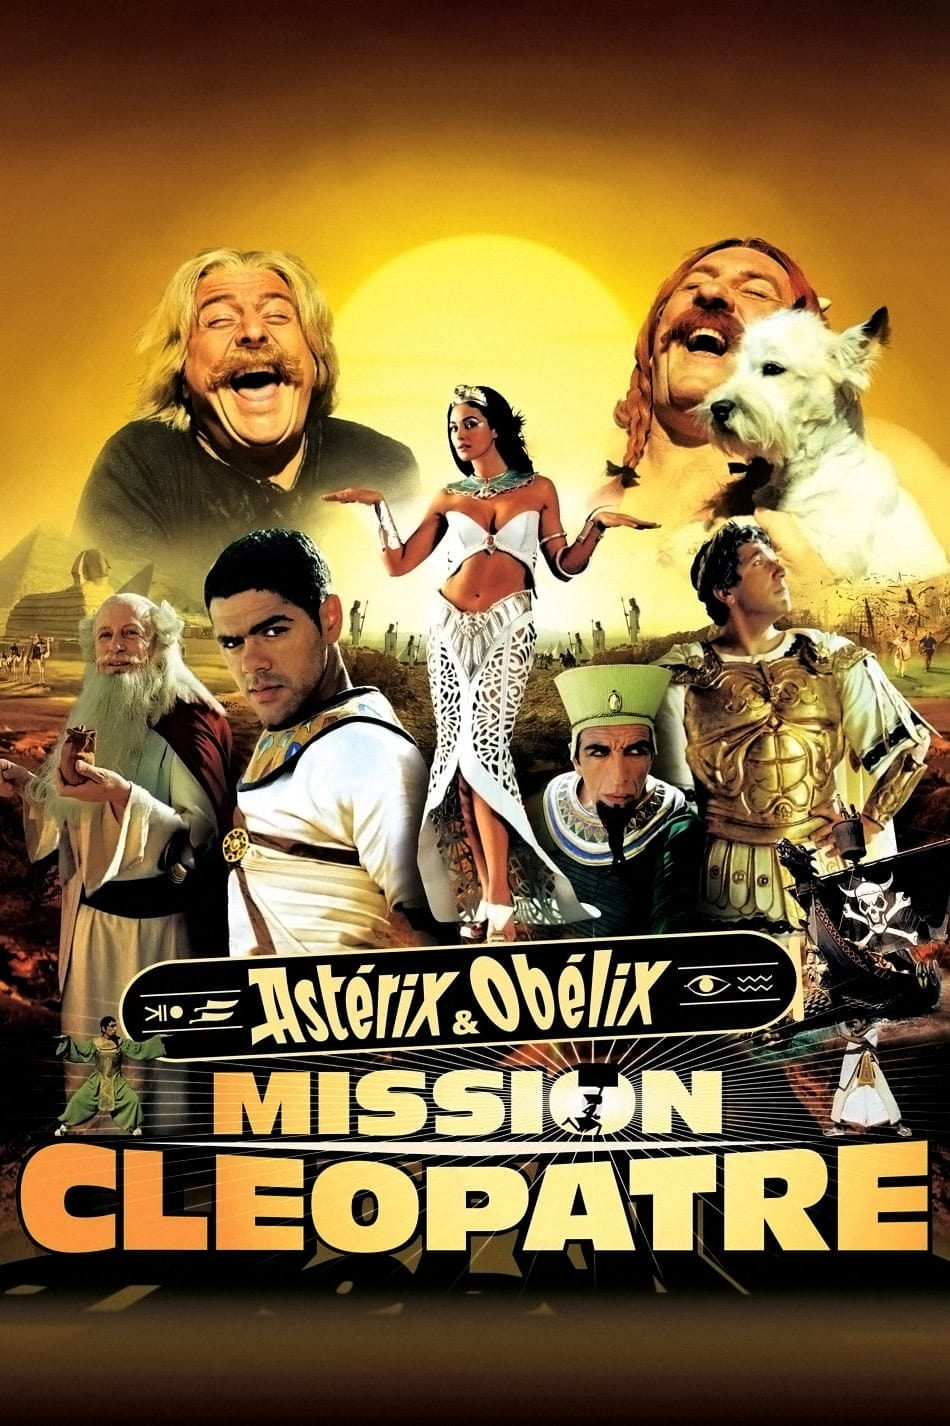 Watch Asterix & Obelix: Mission Cleopatra Online